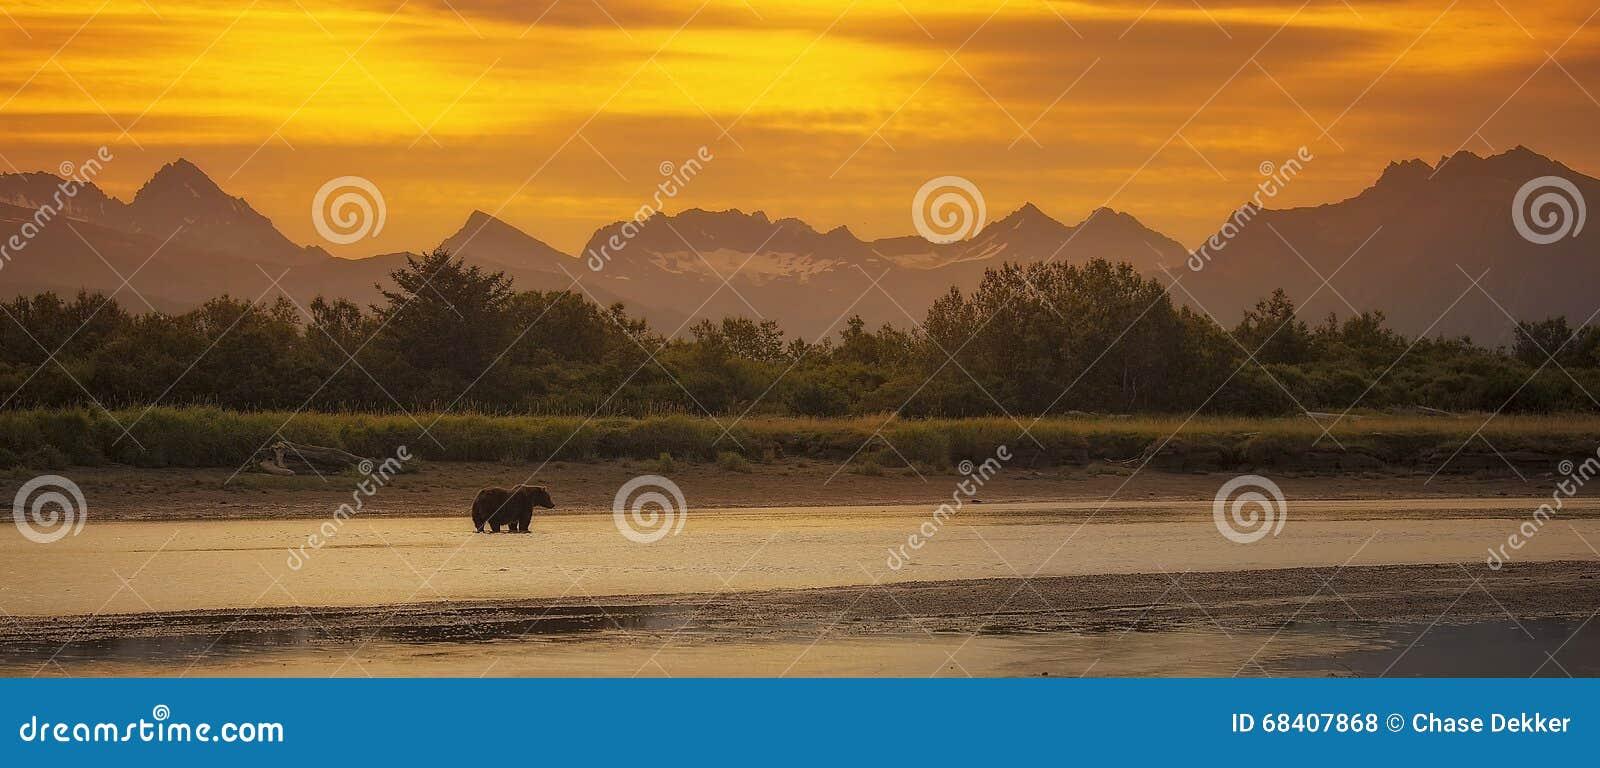 Прибрежный бурый медведь